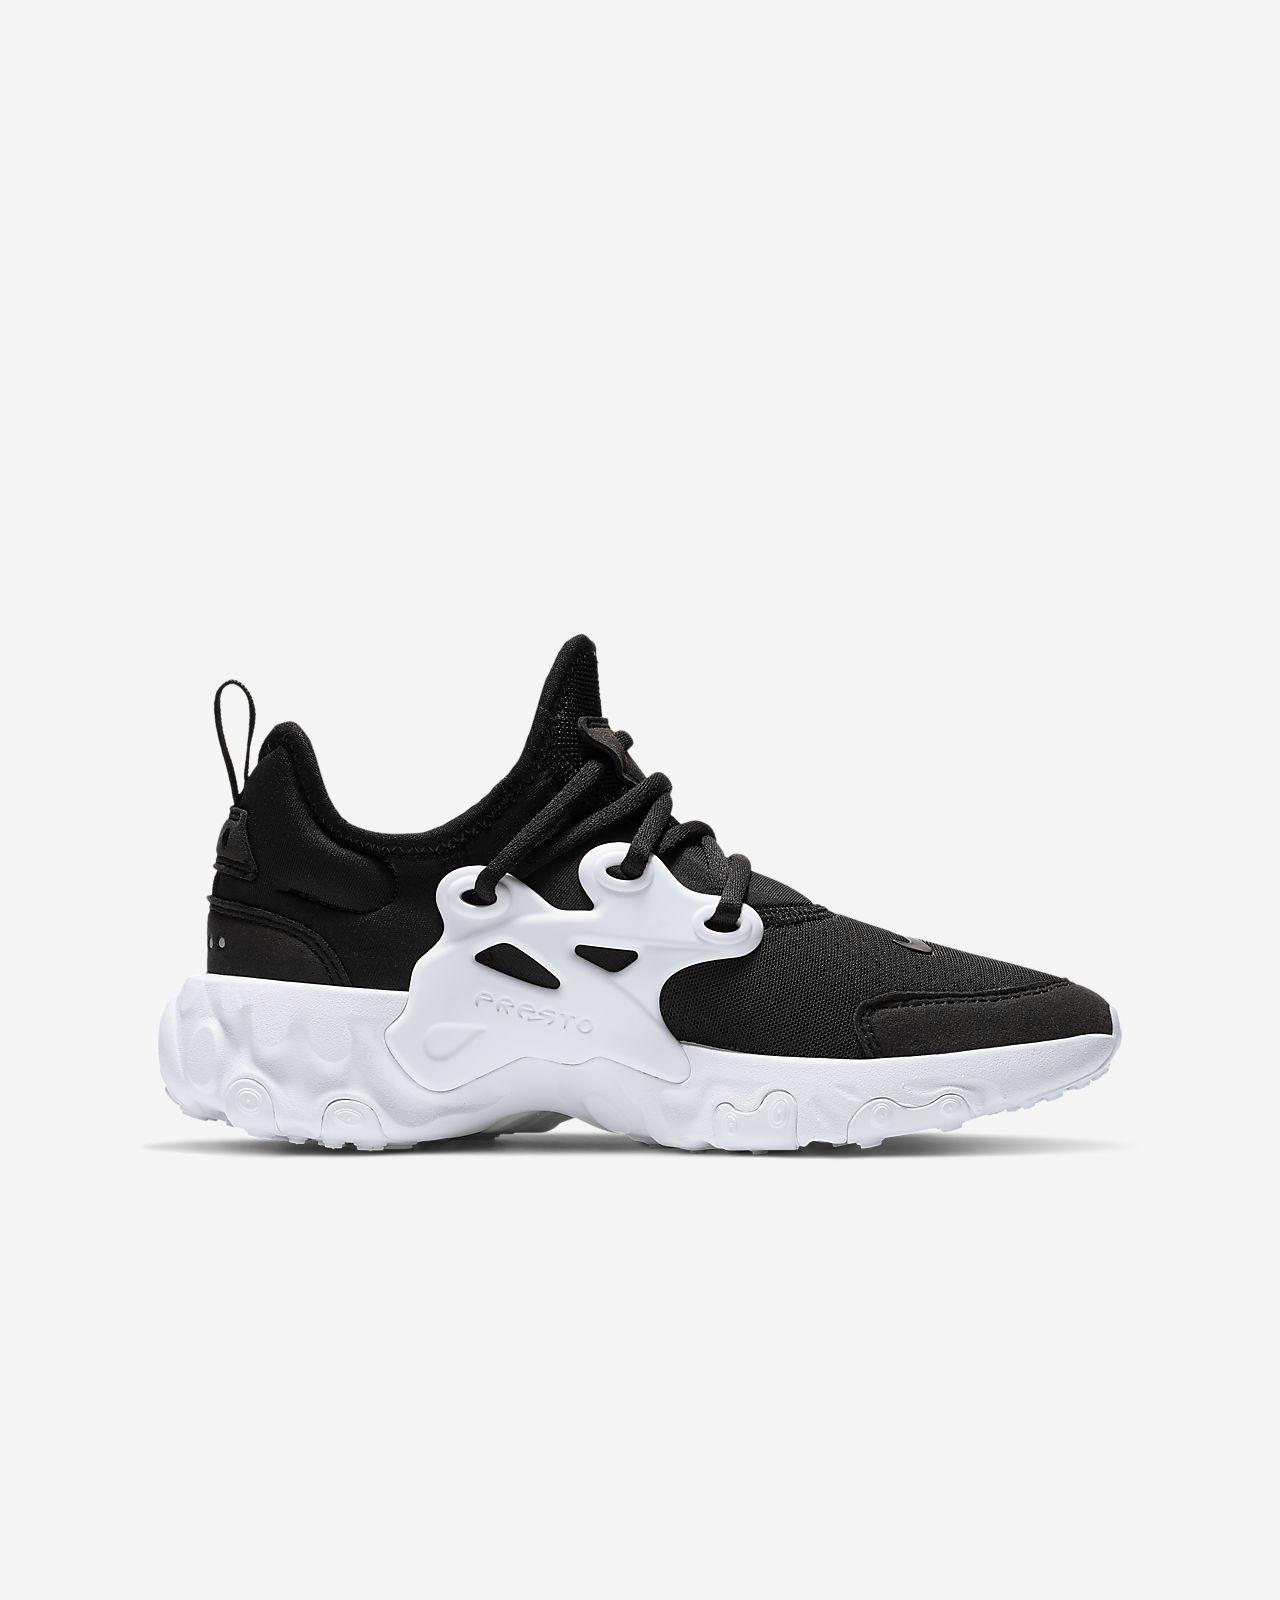 Nike React Presto Schuh für ältere Kinder